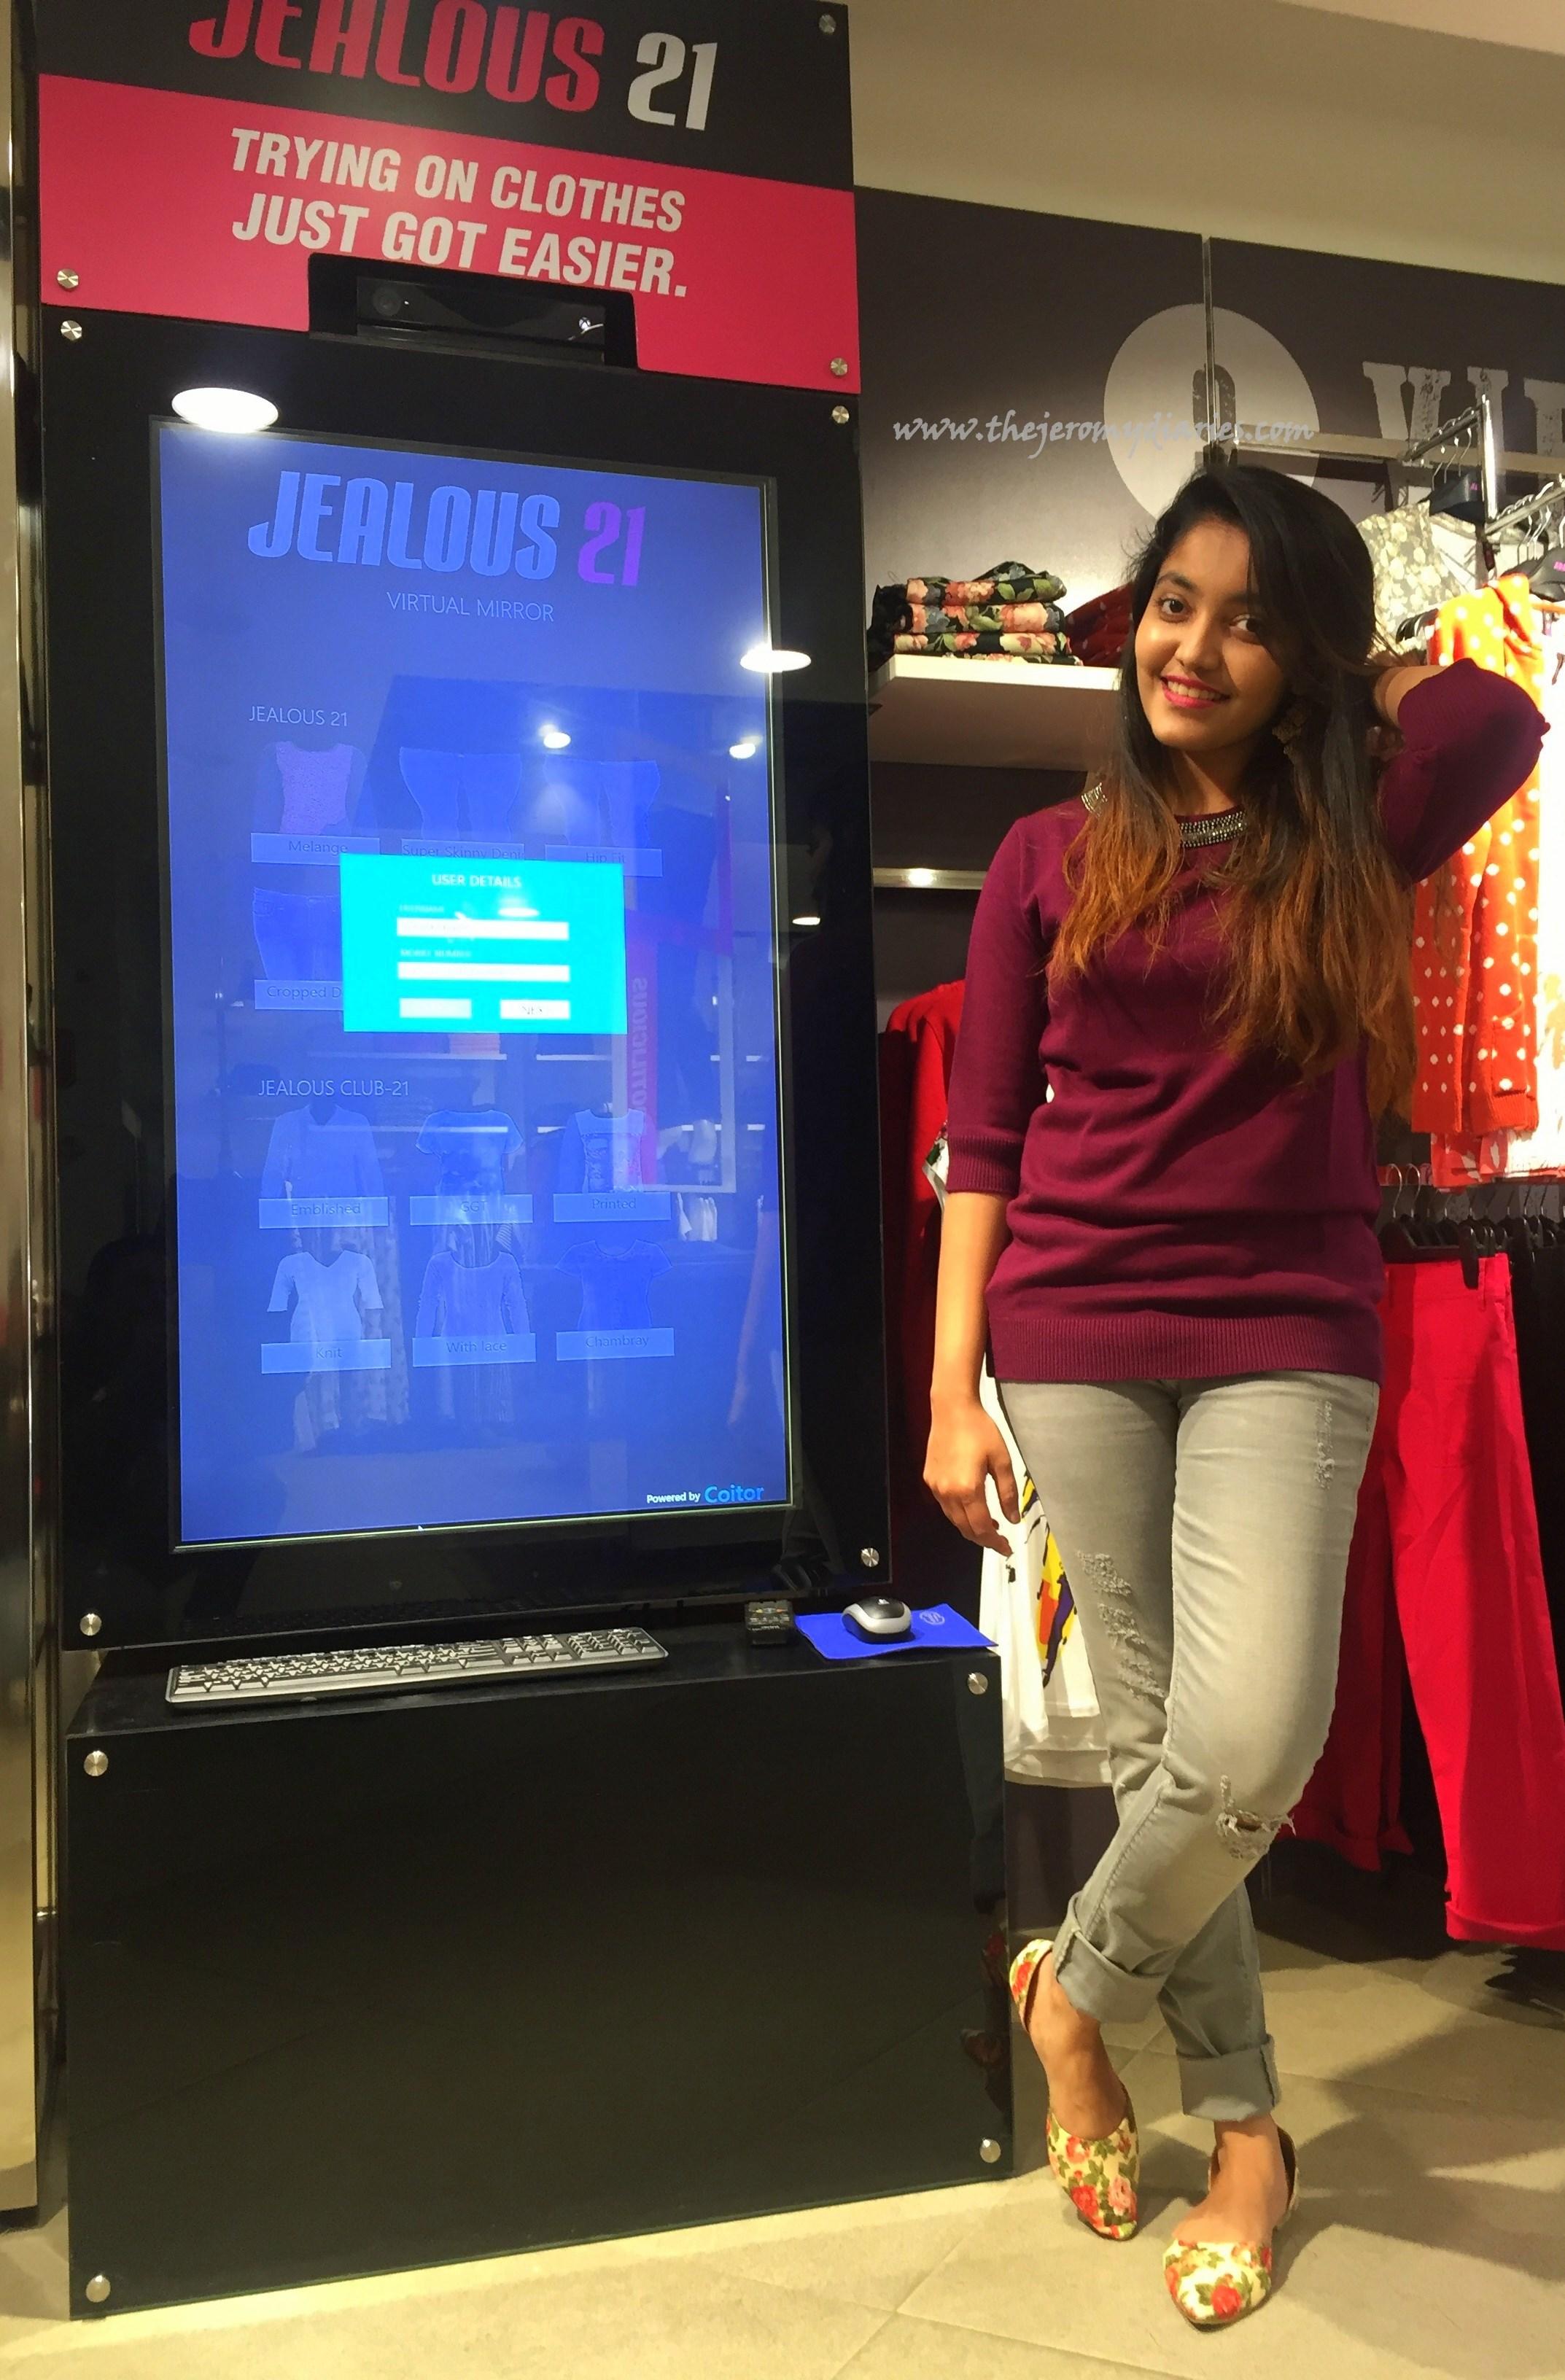 jealous 21 virtual mirror collaboration the jeromy diaries  (2146 x 3264)